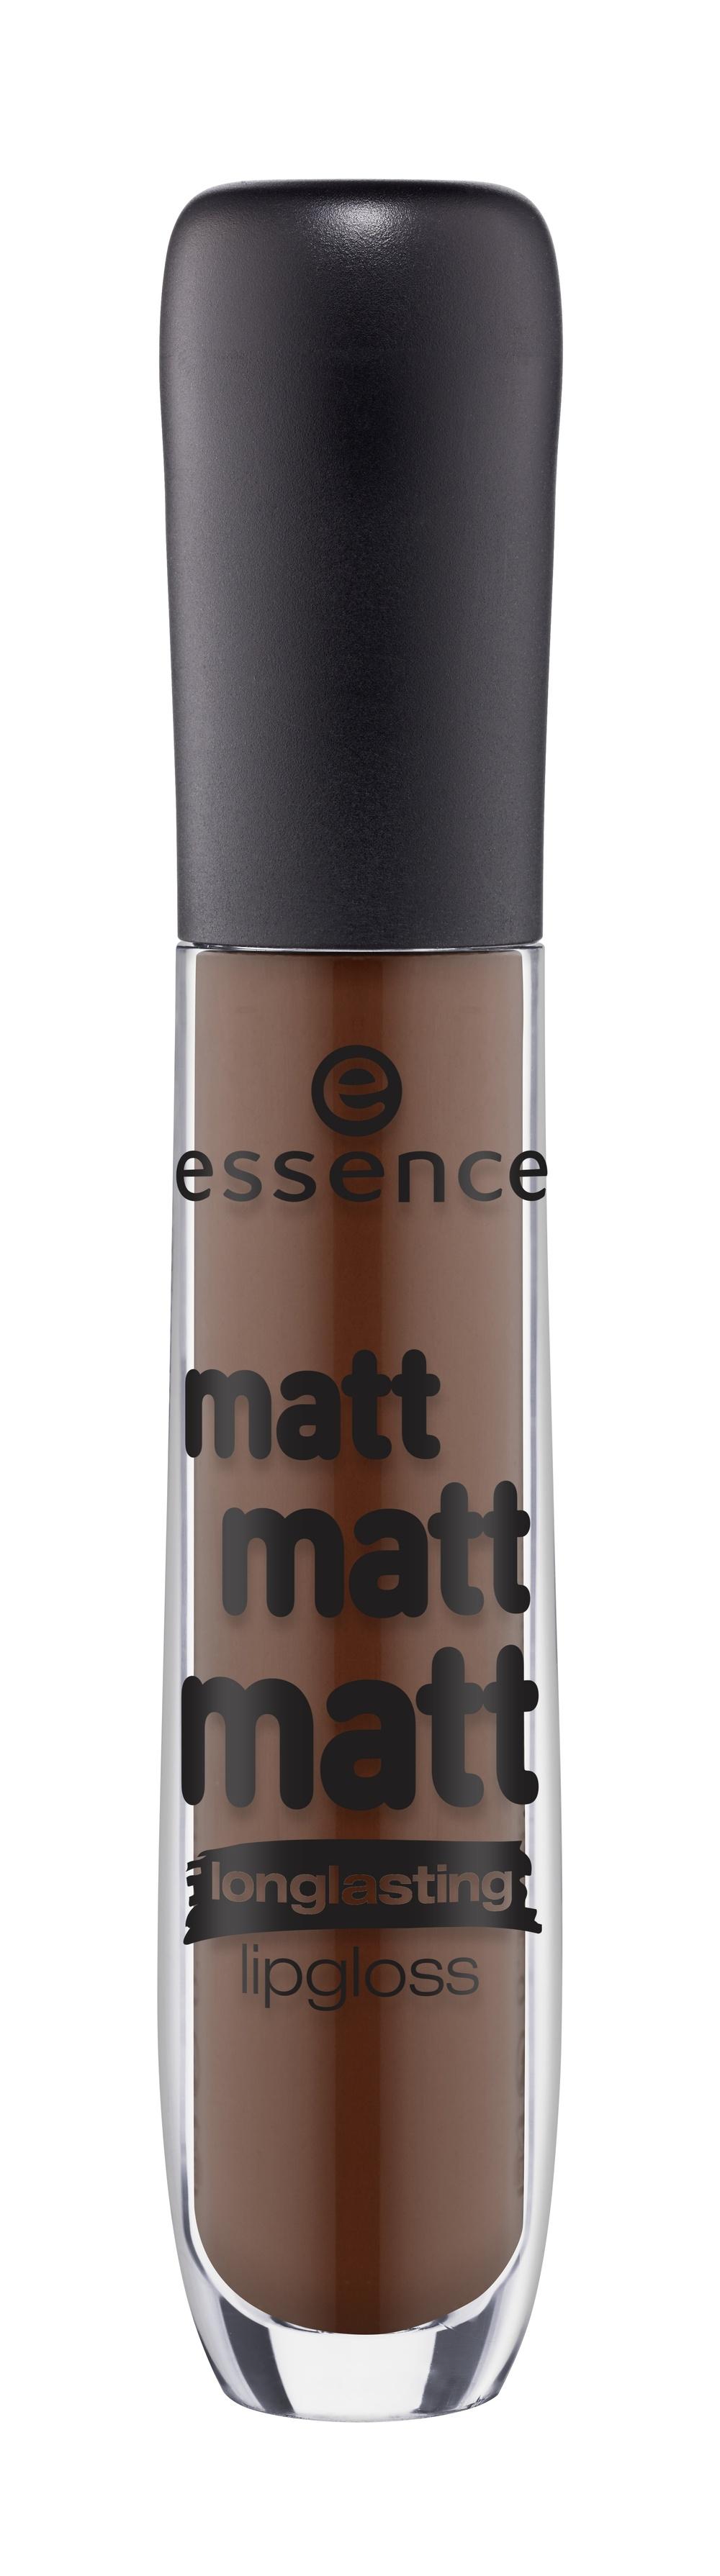 Essence Блеск для Губ Matt Matt Matt тон 09 Шоколадный недорого